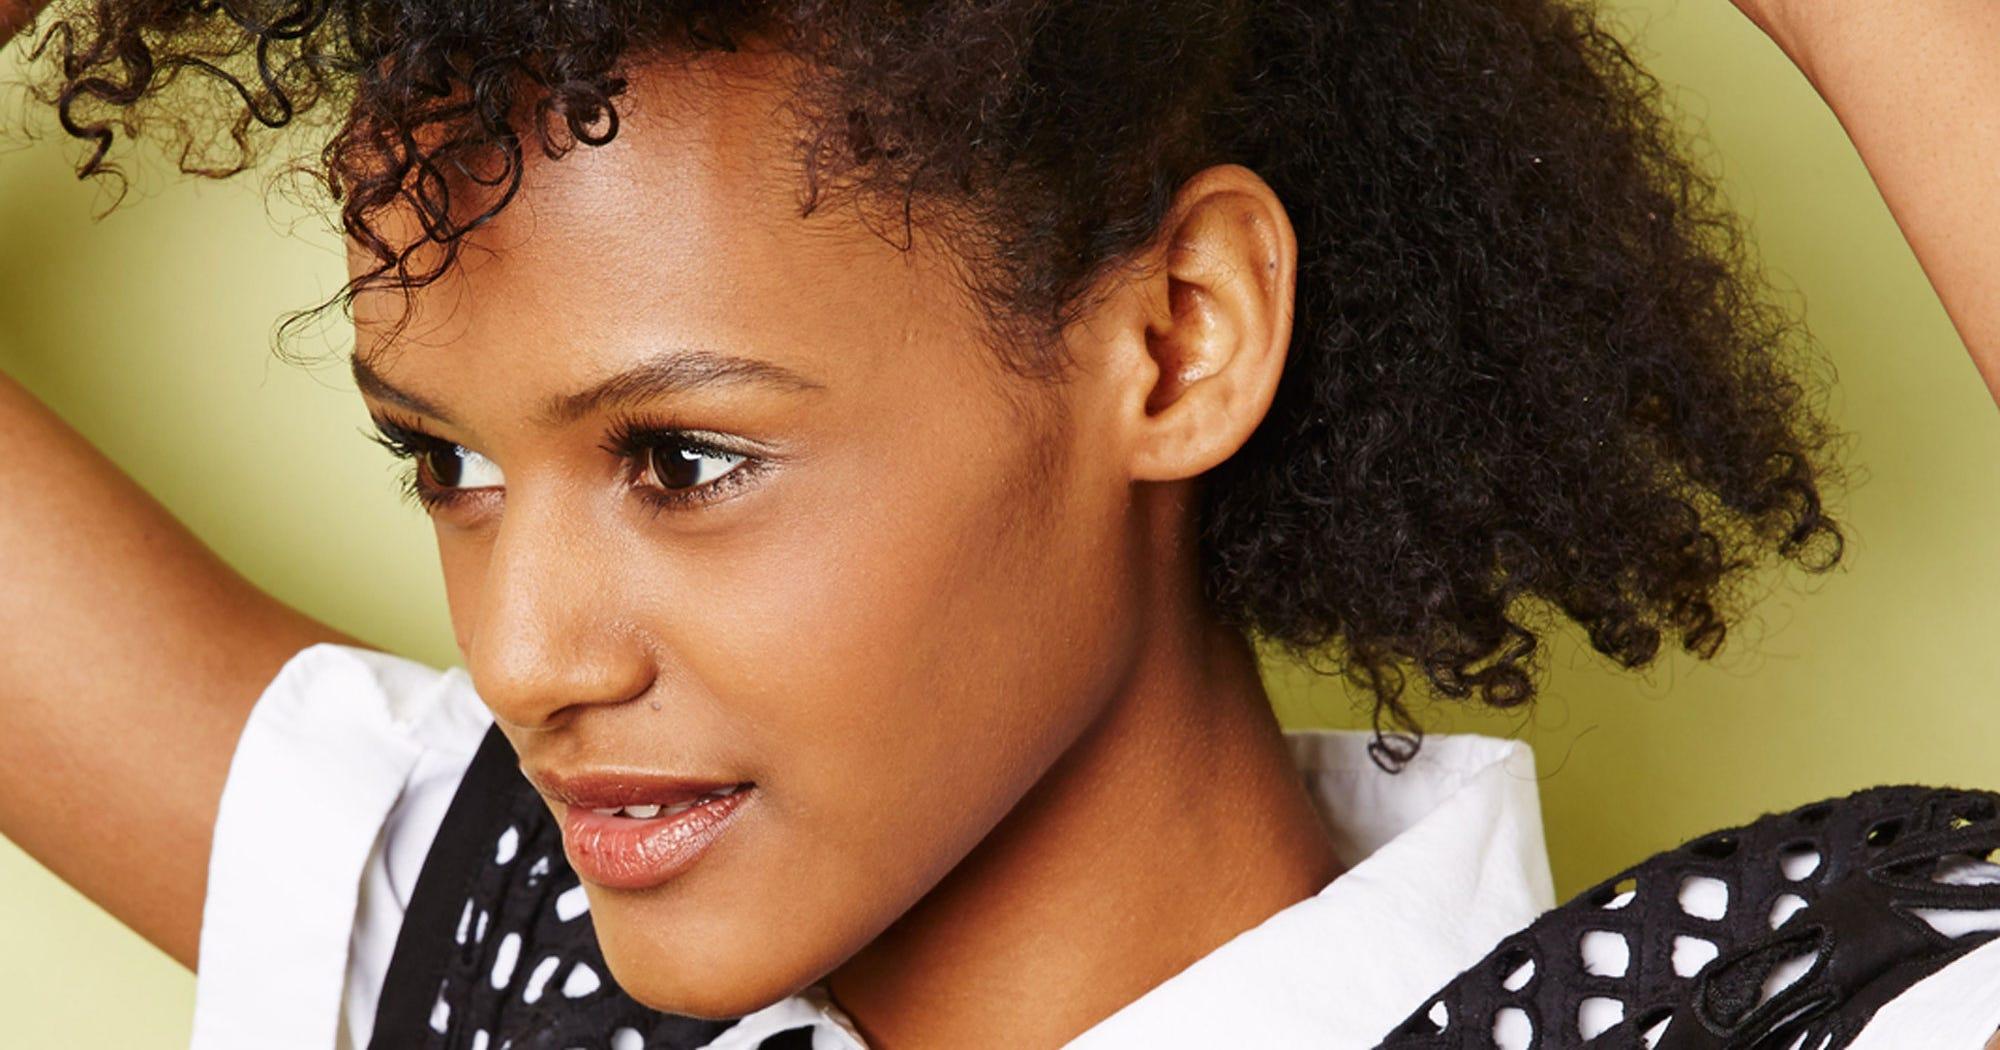 Astonishing Easy Natural Hairstyles For Transitioning Hair Short Hairstyles For Black Women Fulllsitofus